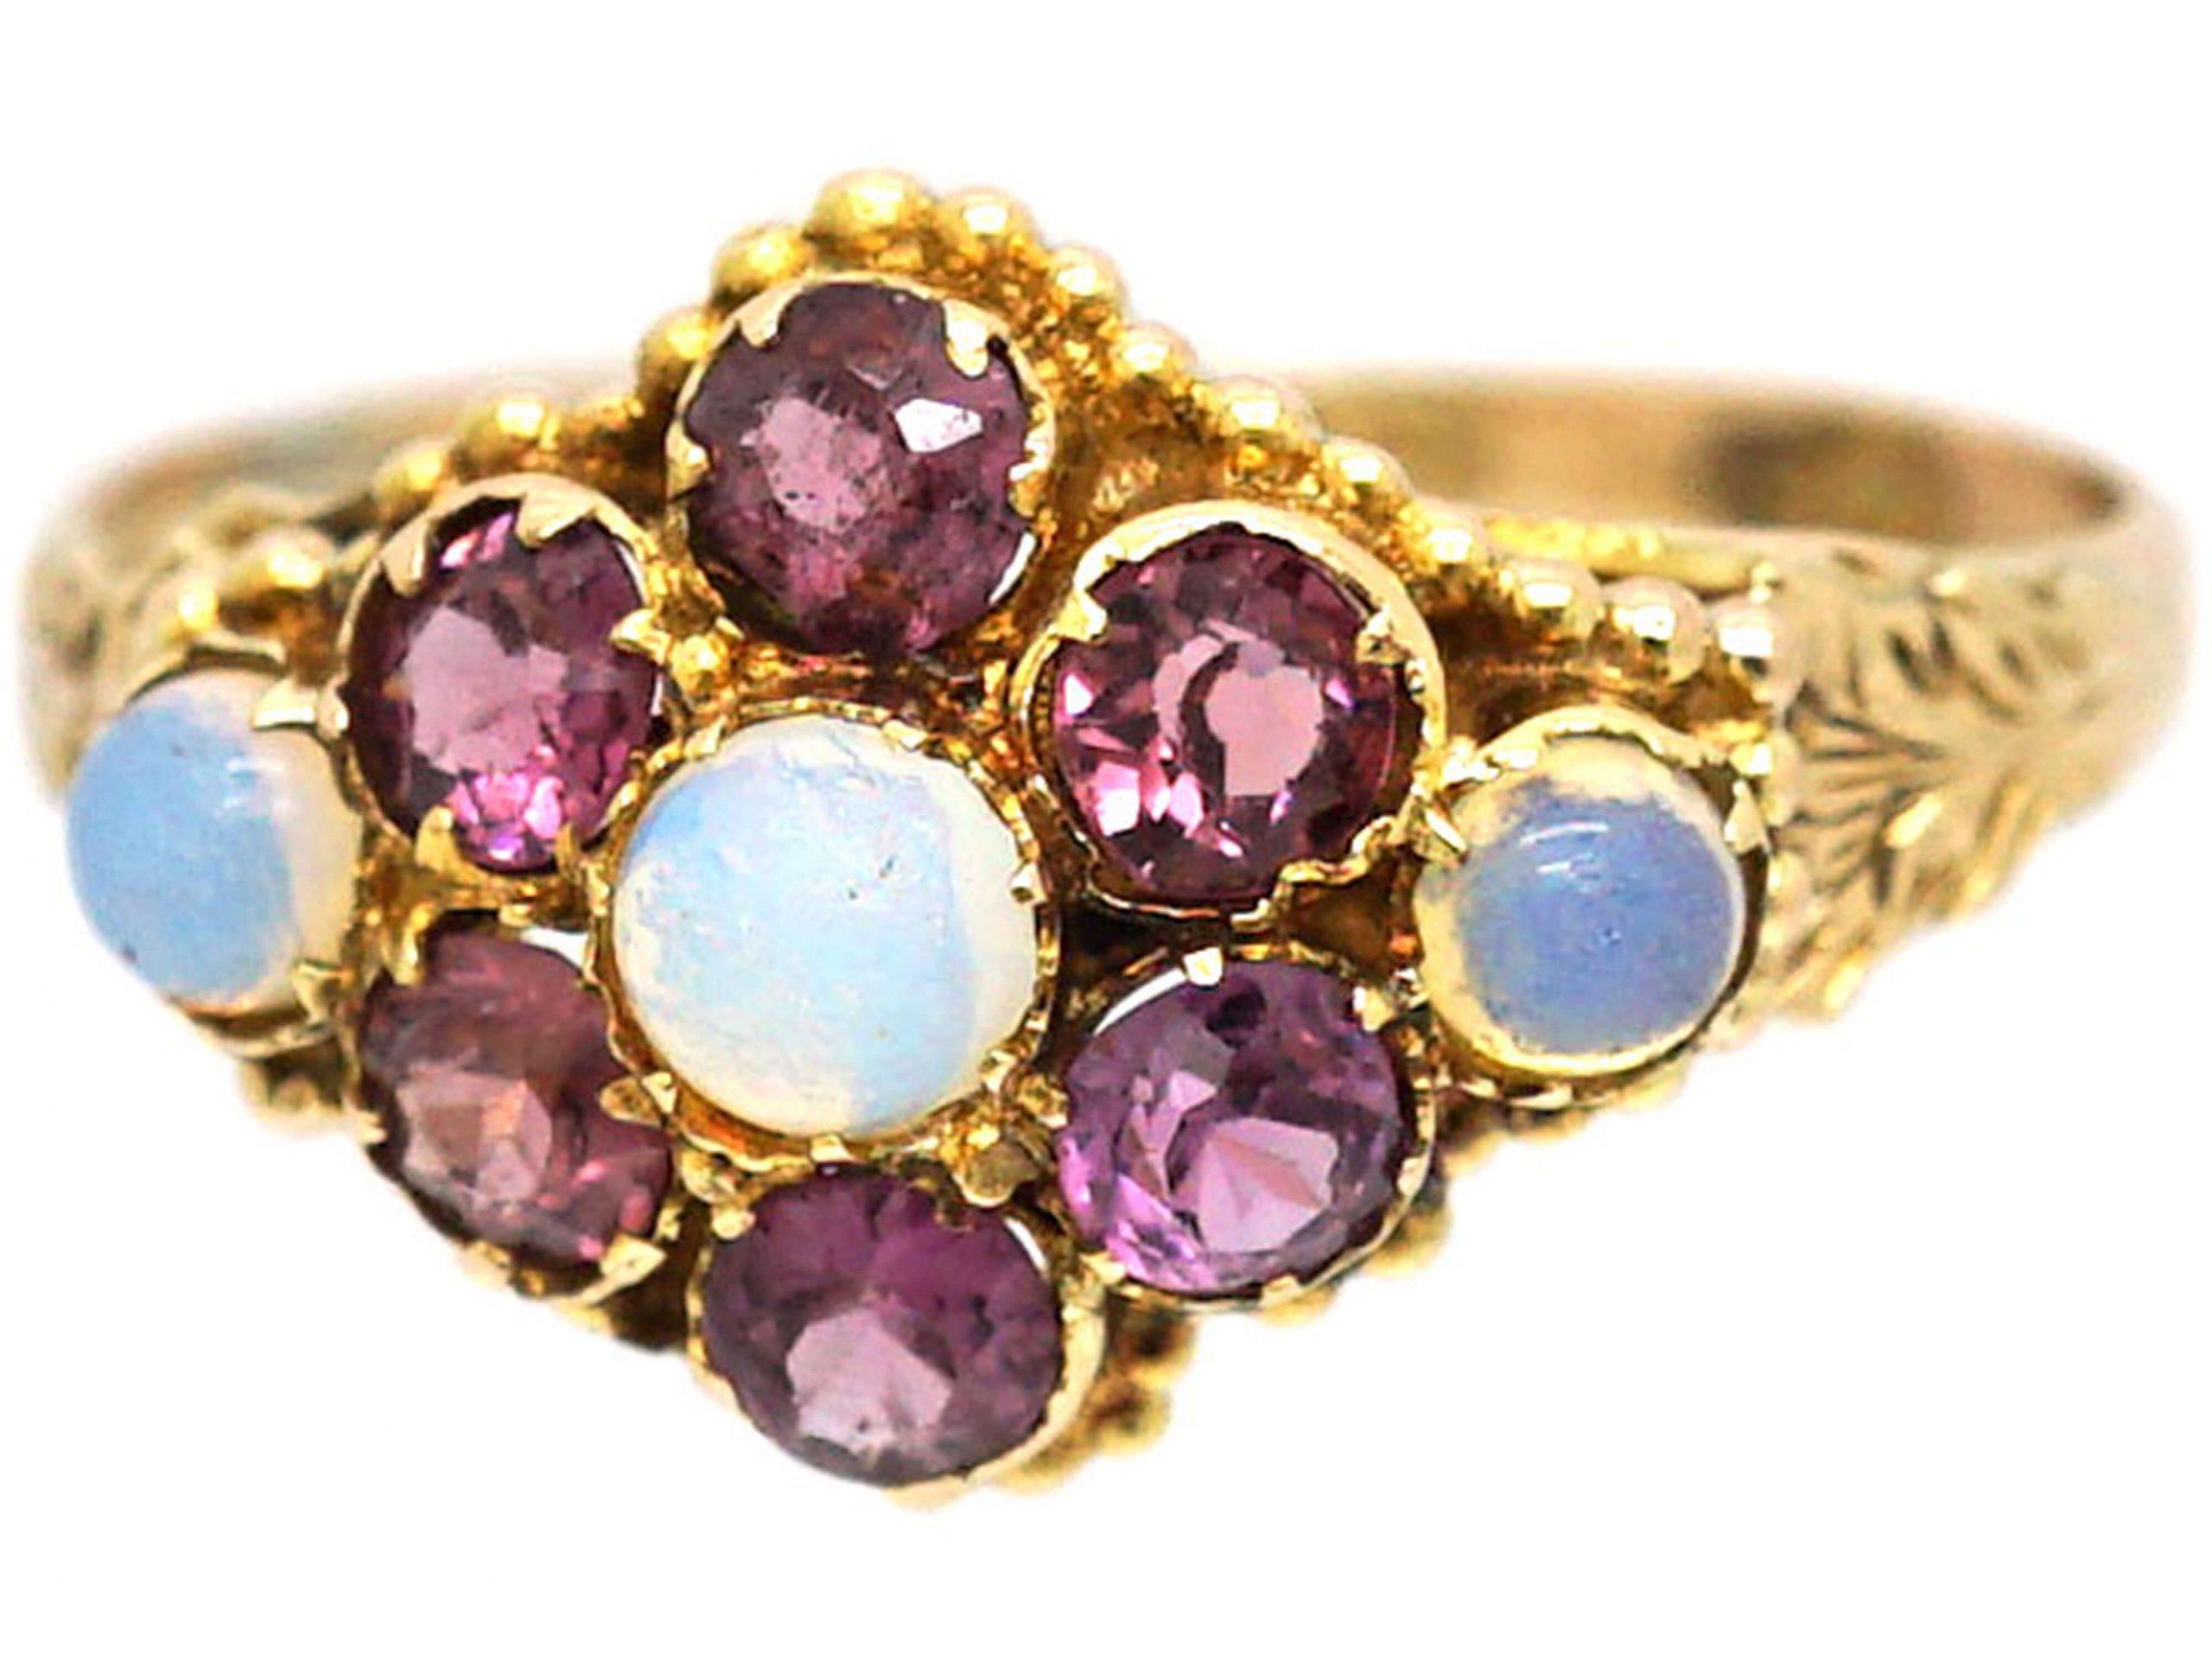 Regency 9ct Gold, Garnet & Opal Cluster Ring